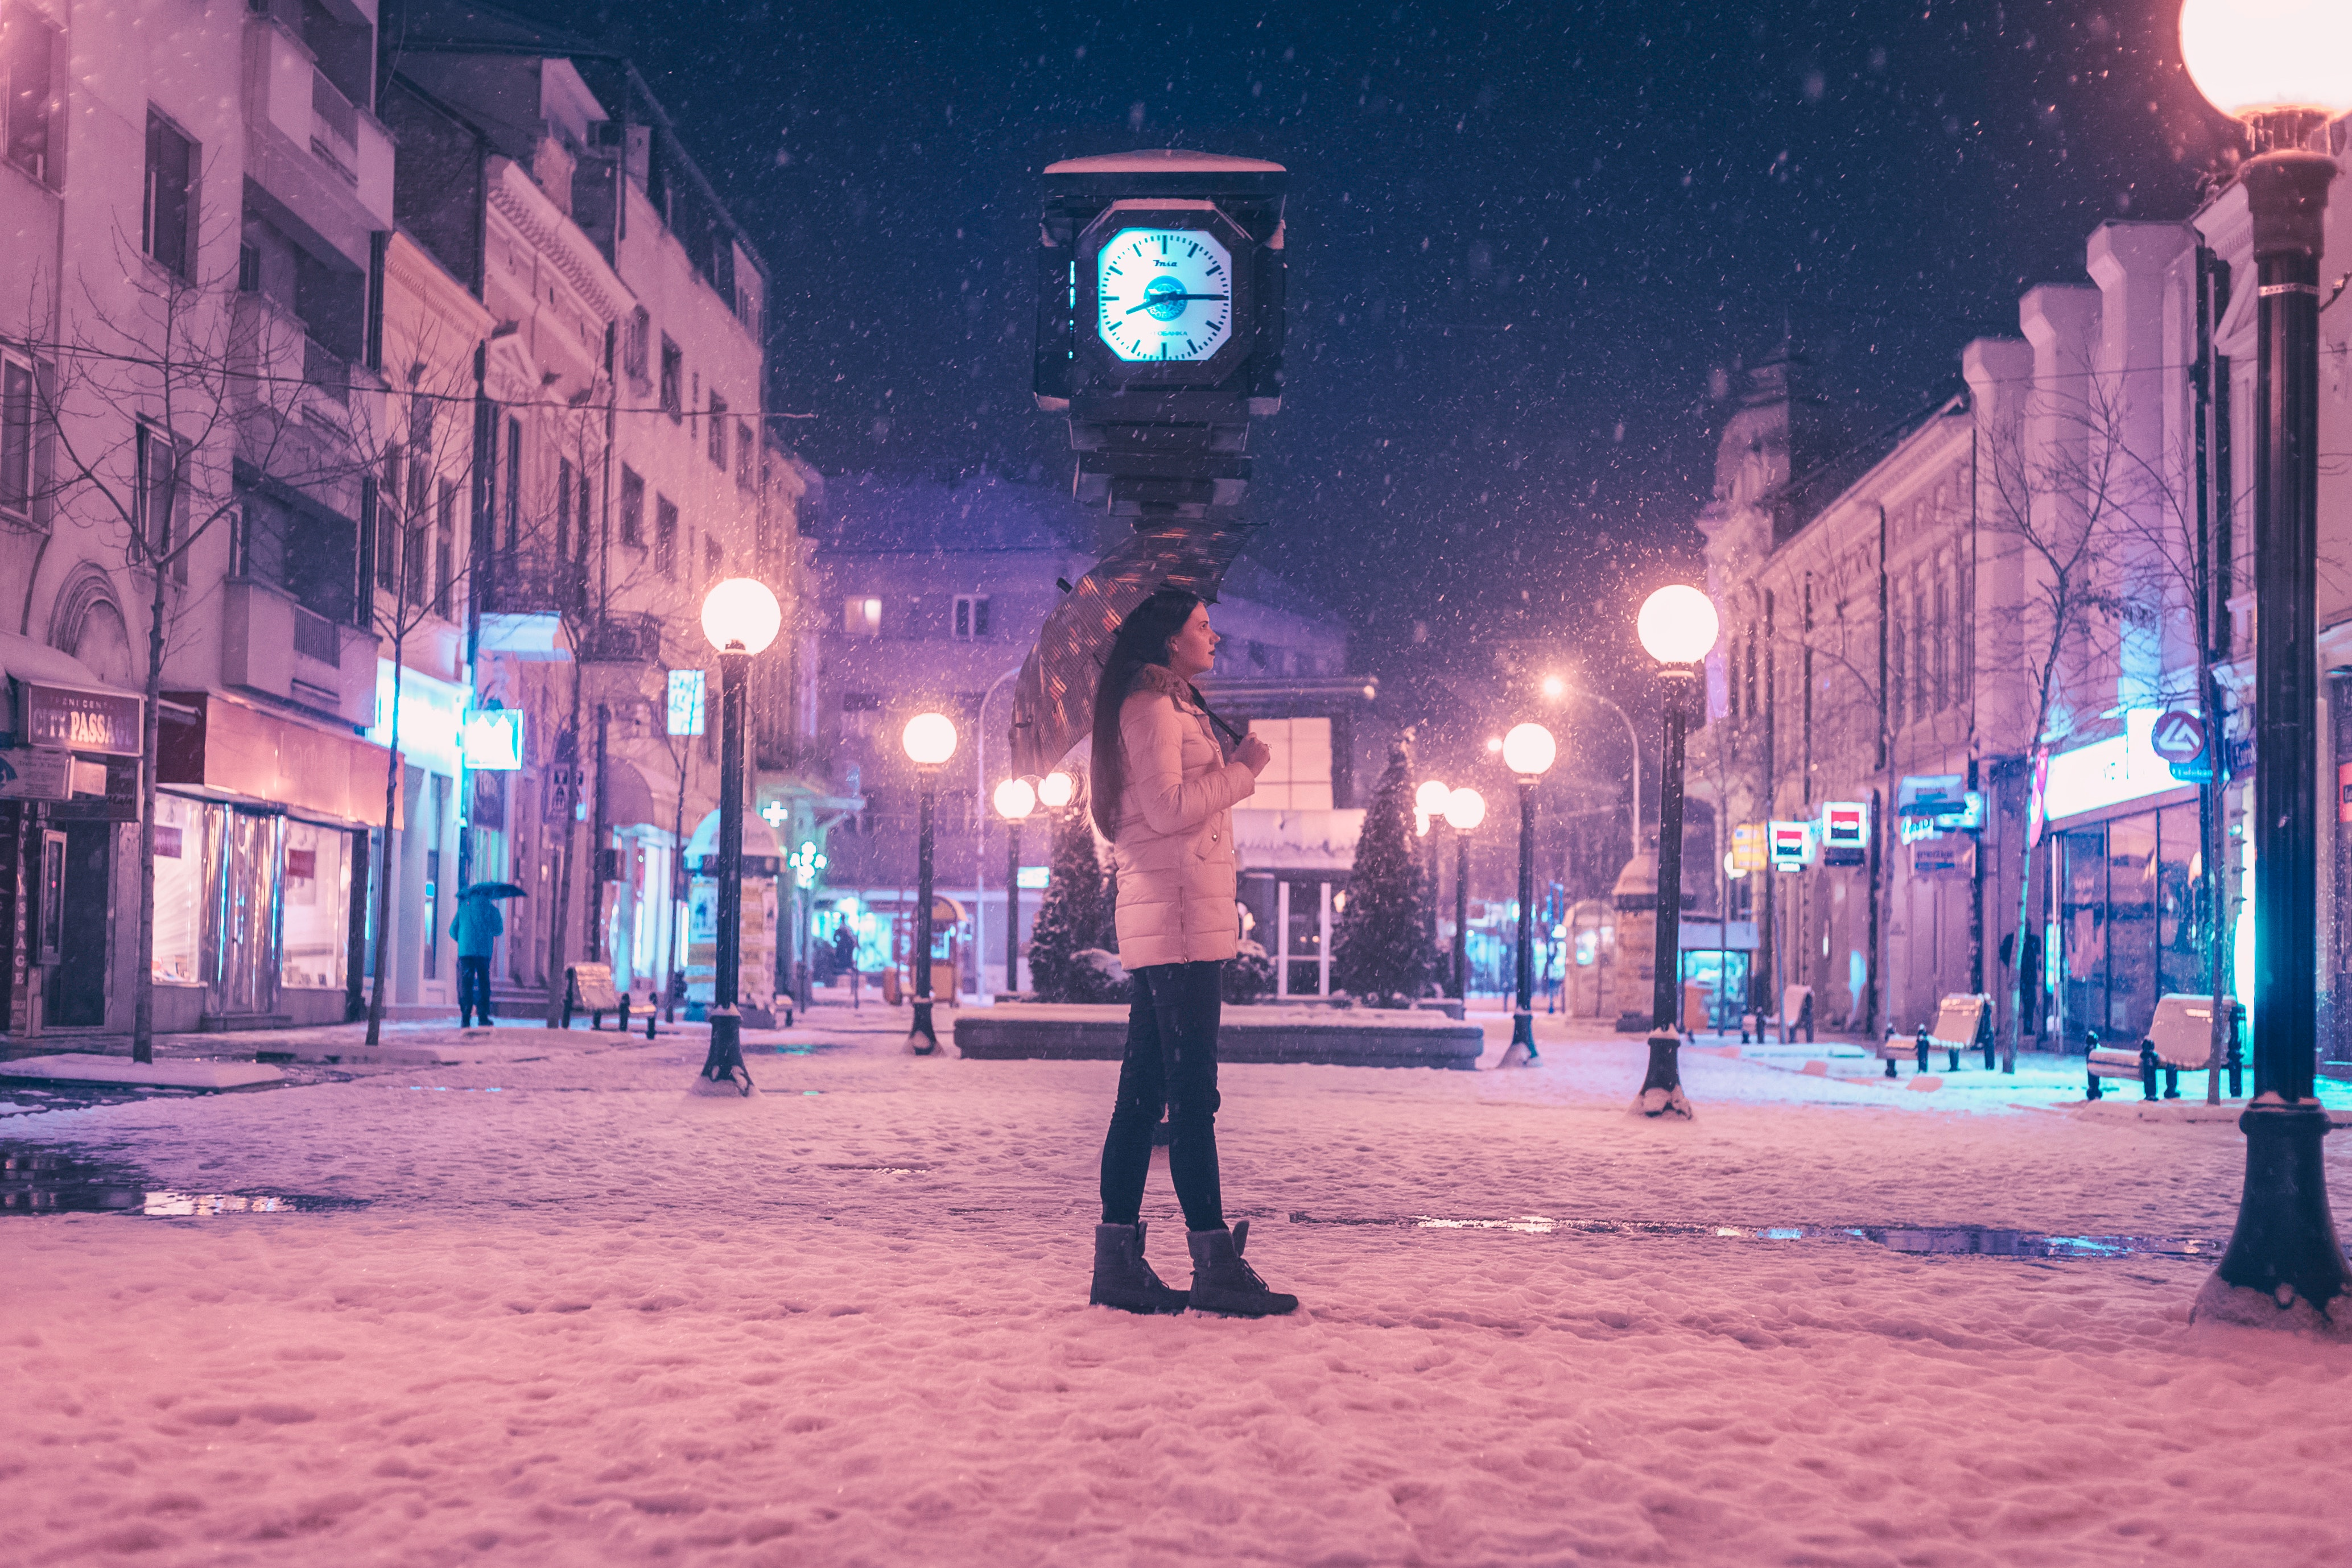 Woman walking on street near light post during winter season photo